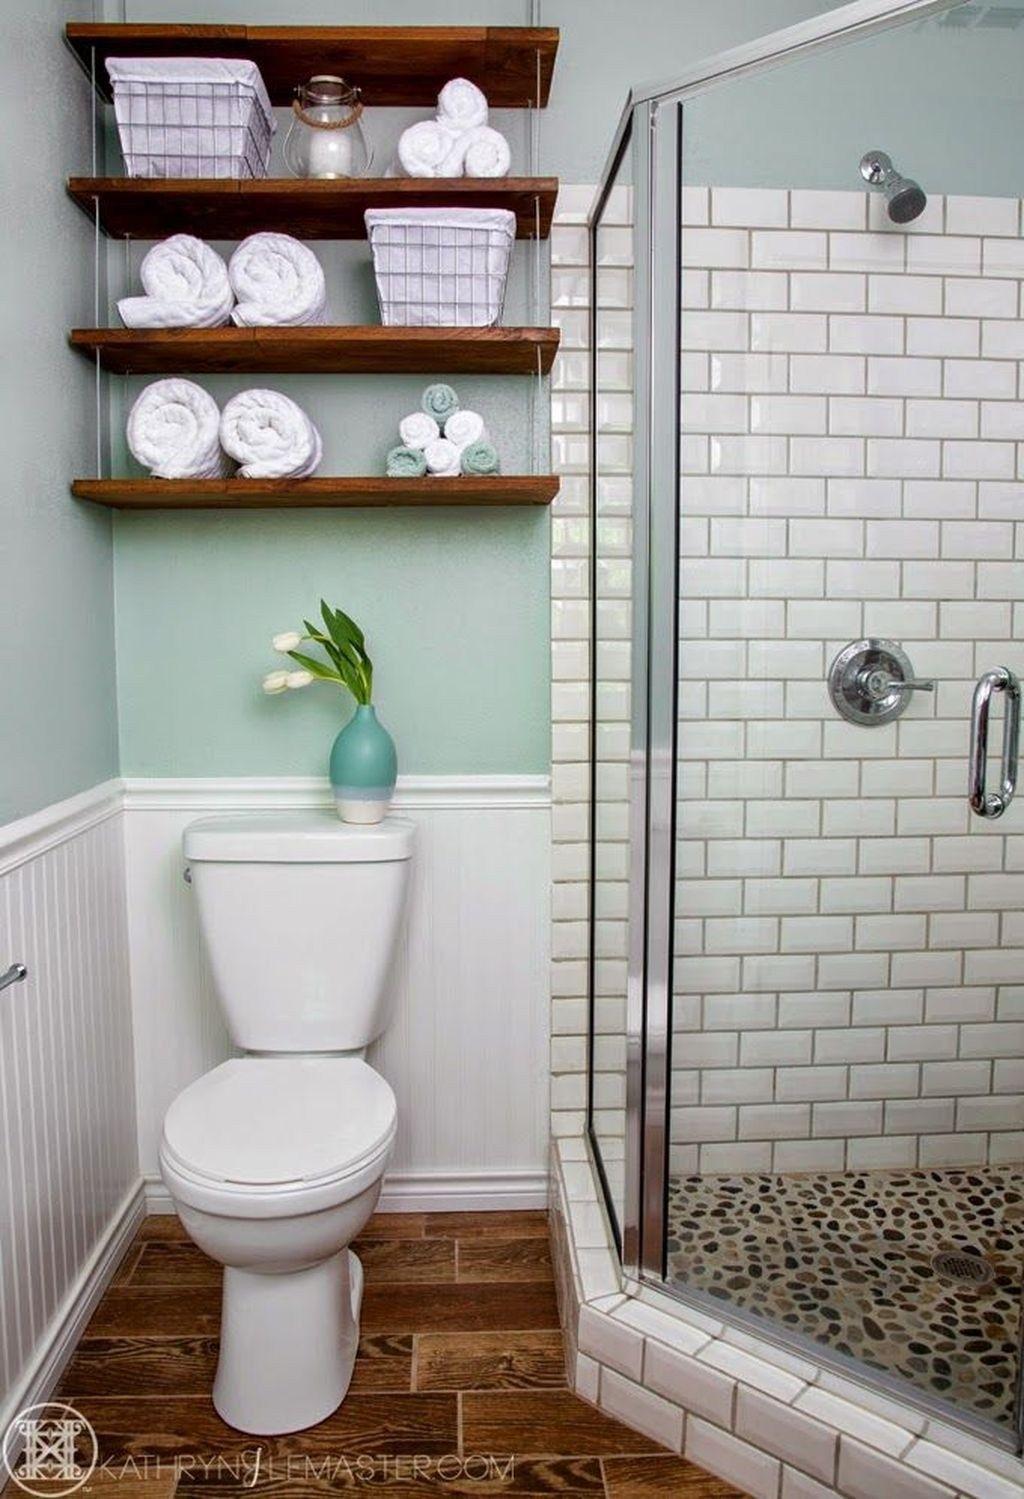 44 awesome small bathroom design ideas small bathroom